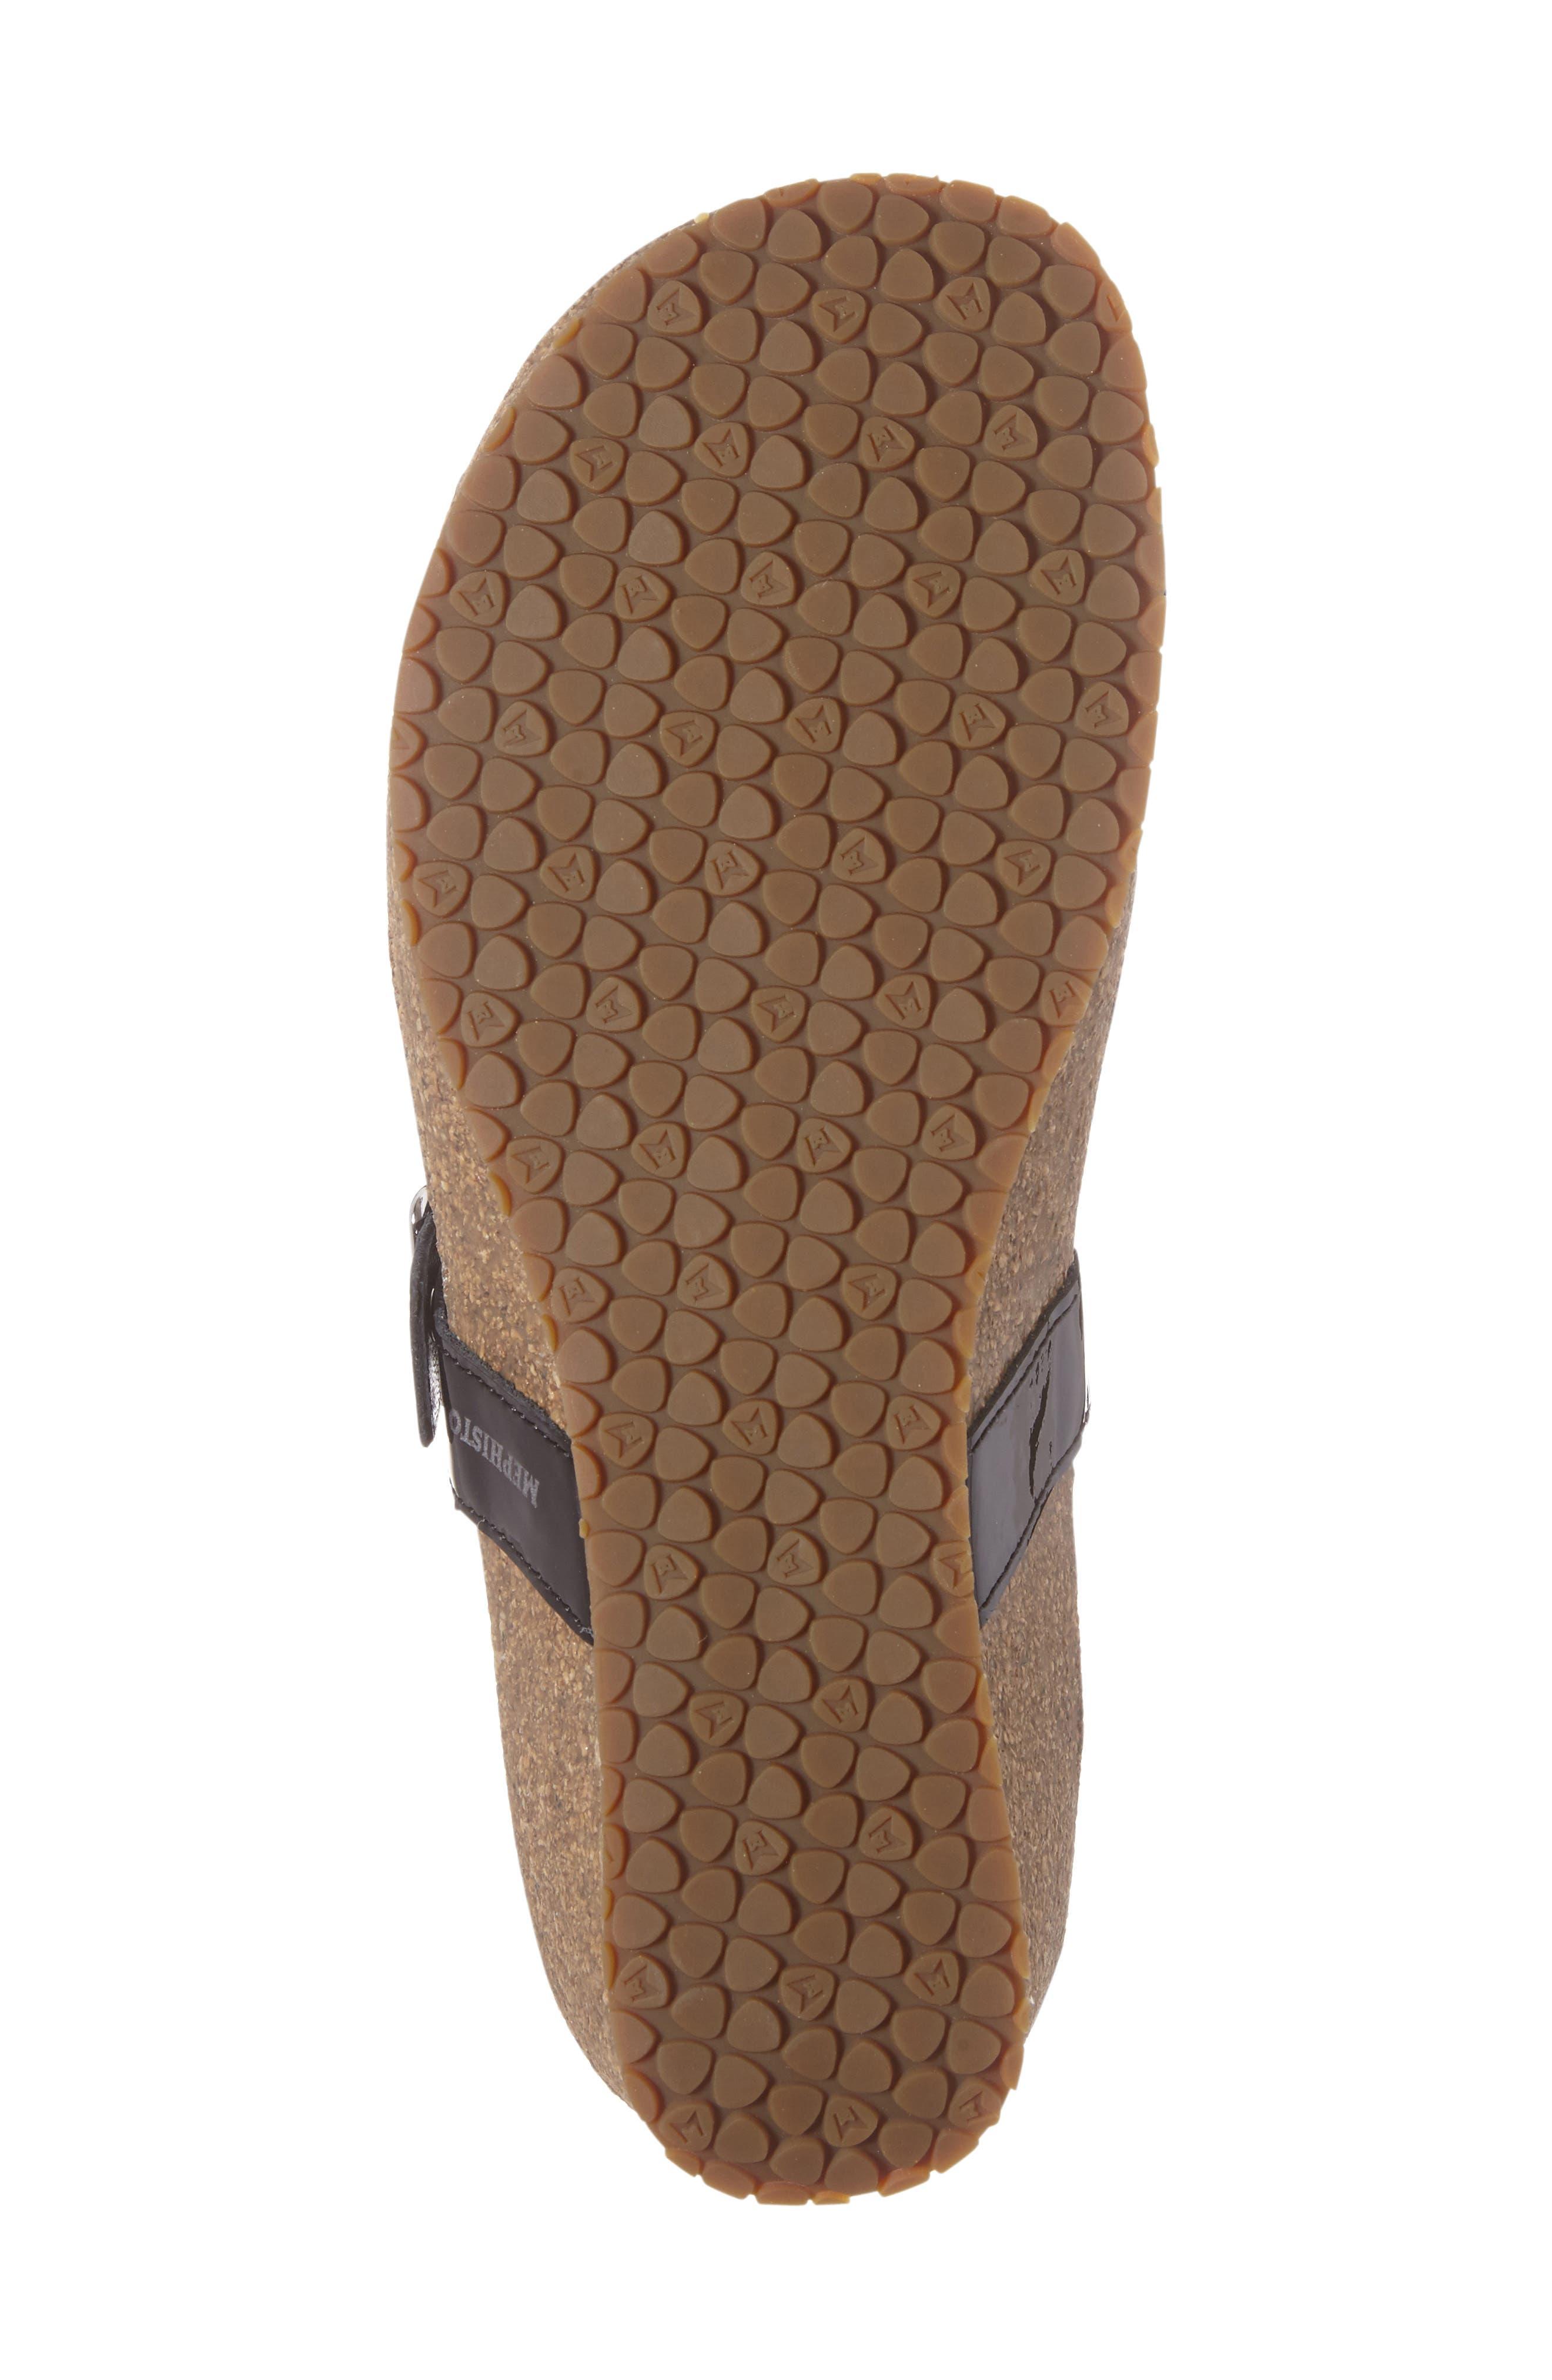 Ilaria Embellished Wedge Sandal,                             Alternate thumbnail 4, color,                             BLACK PATENT LEATHER